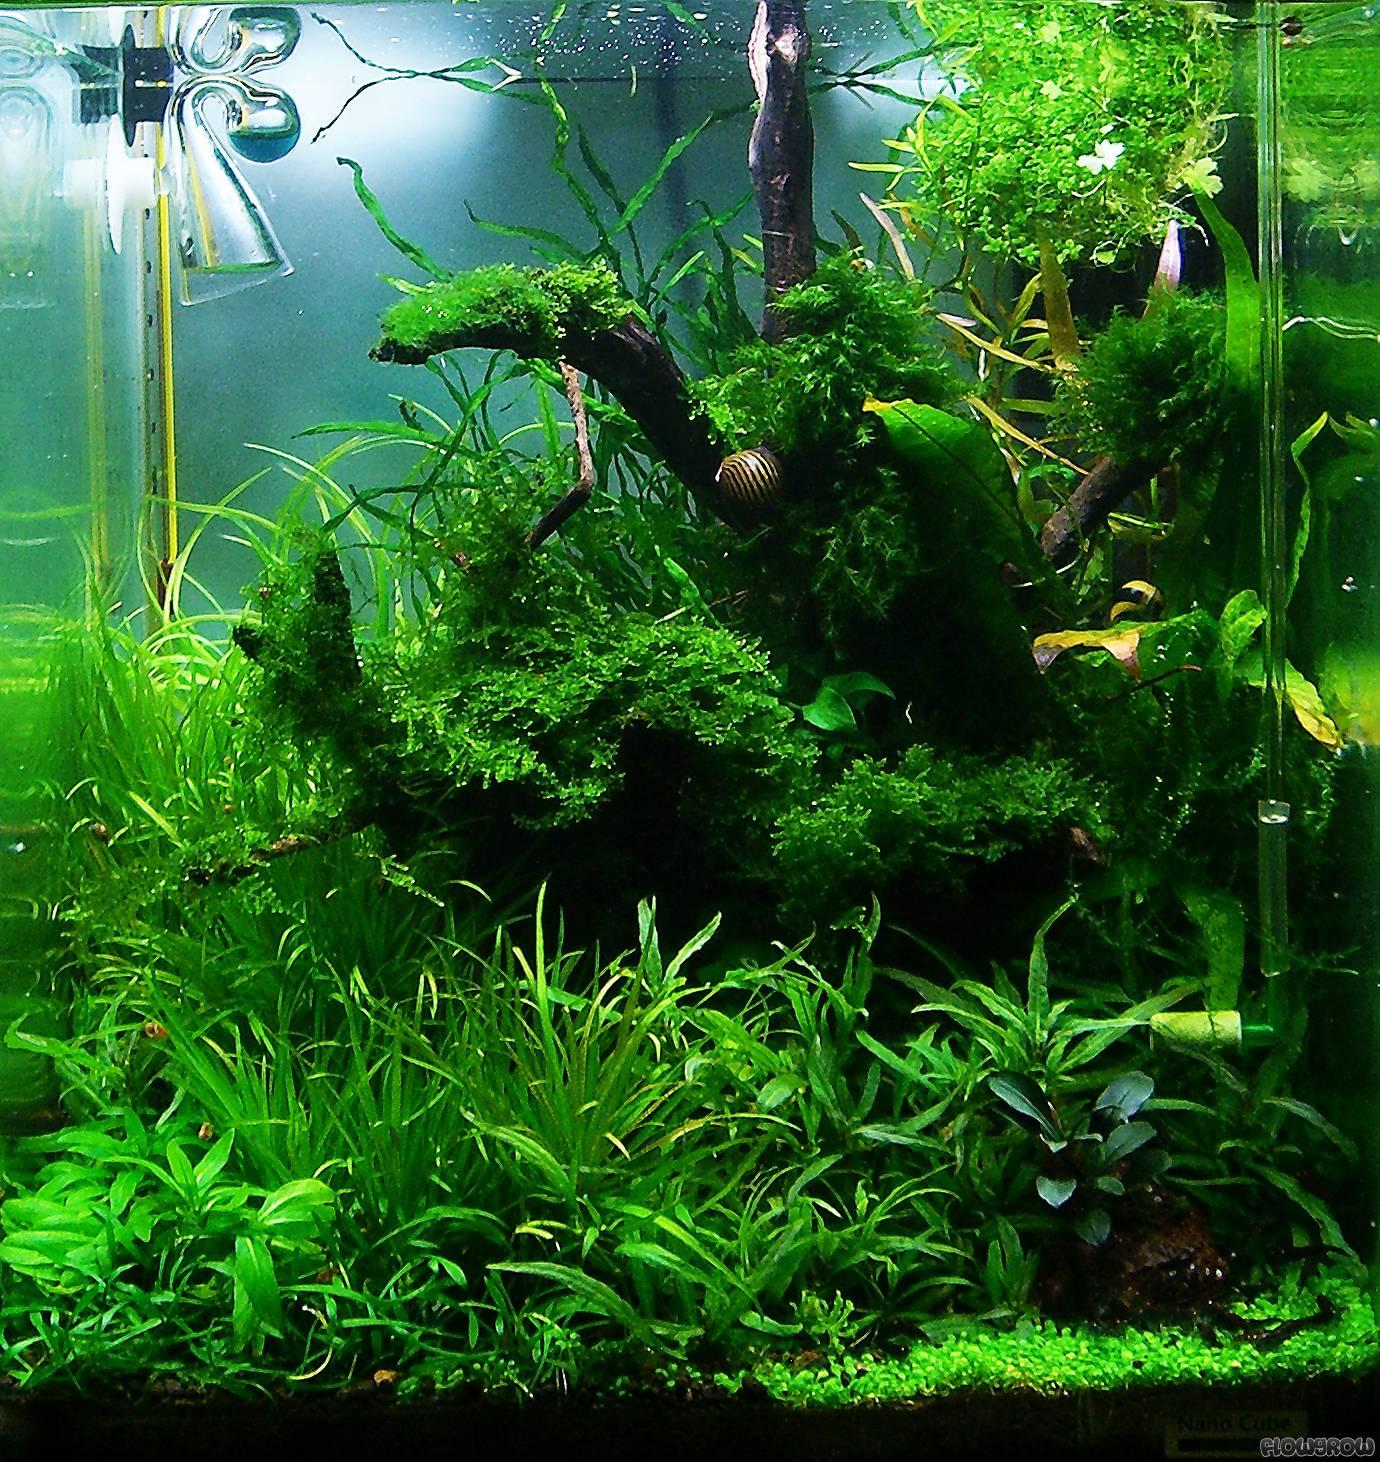 wurzelwerk flowgrow aquascape aquarium database. Black Bedroom Furniture Sets. Home Design Ideas